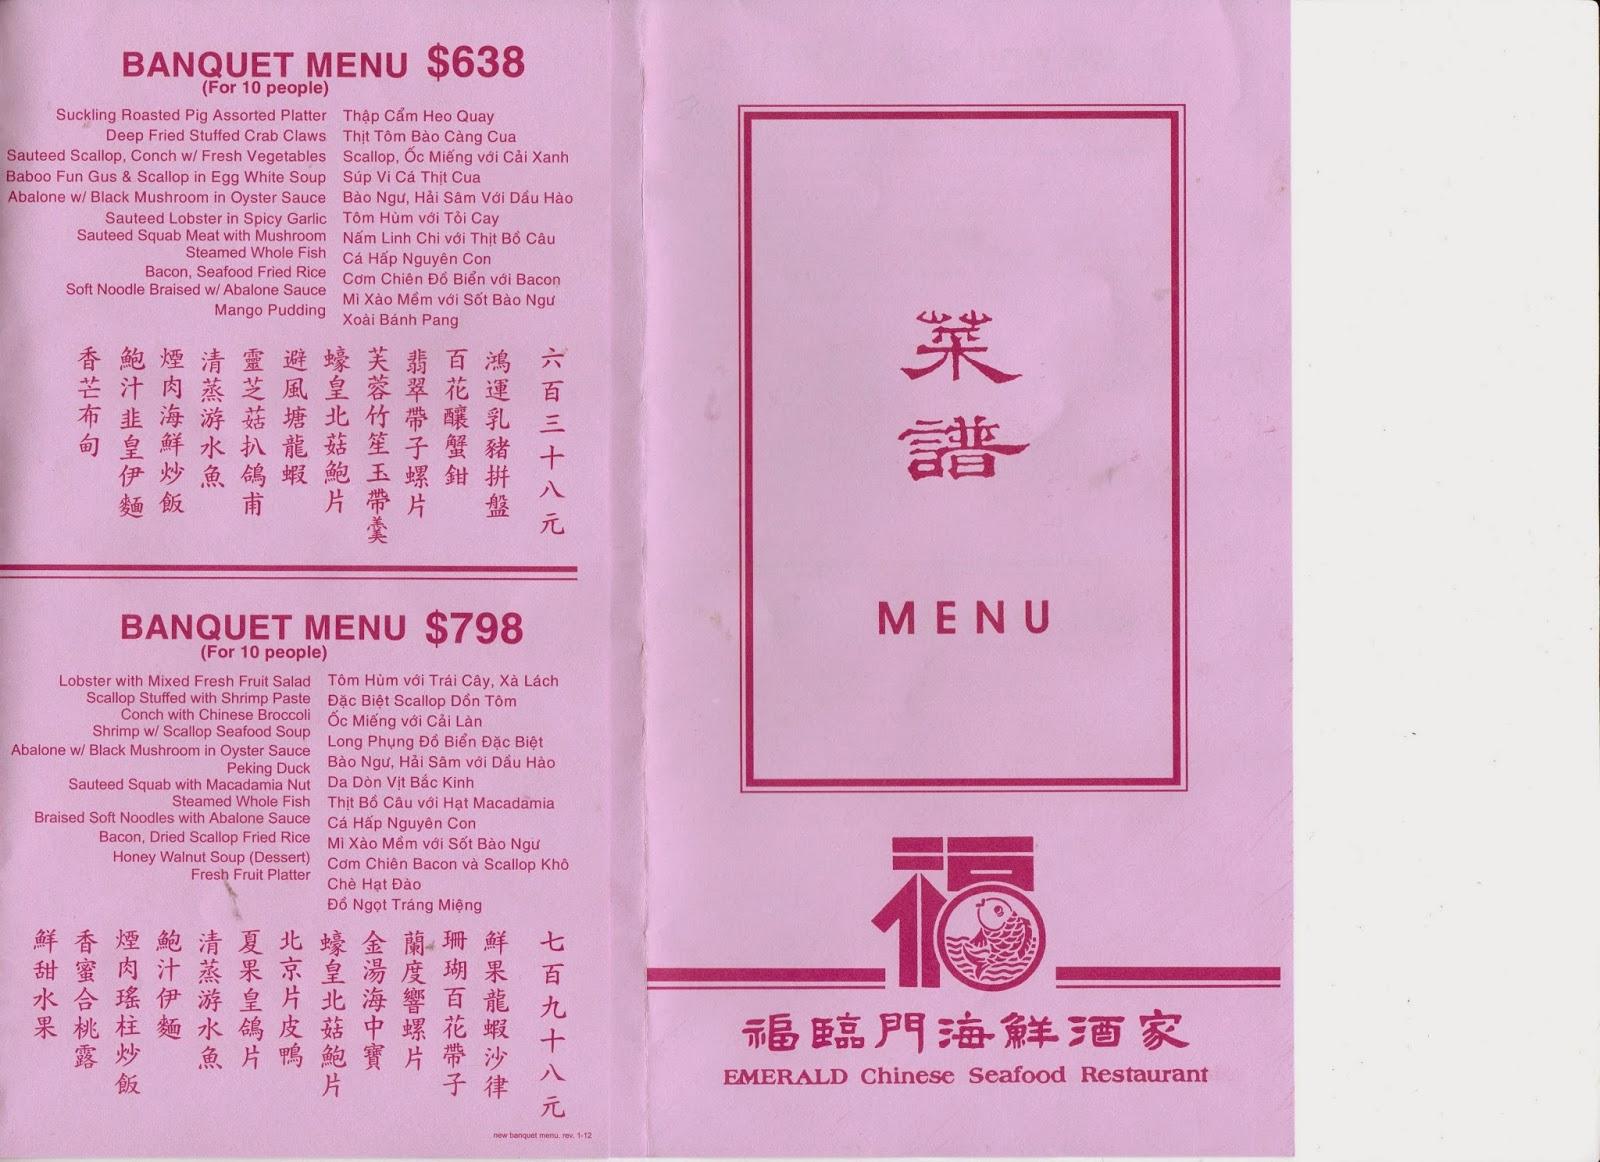 Emerald Chinese Seafood Restaurant San Diego